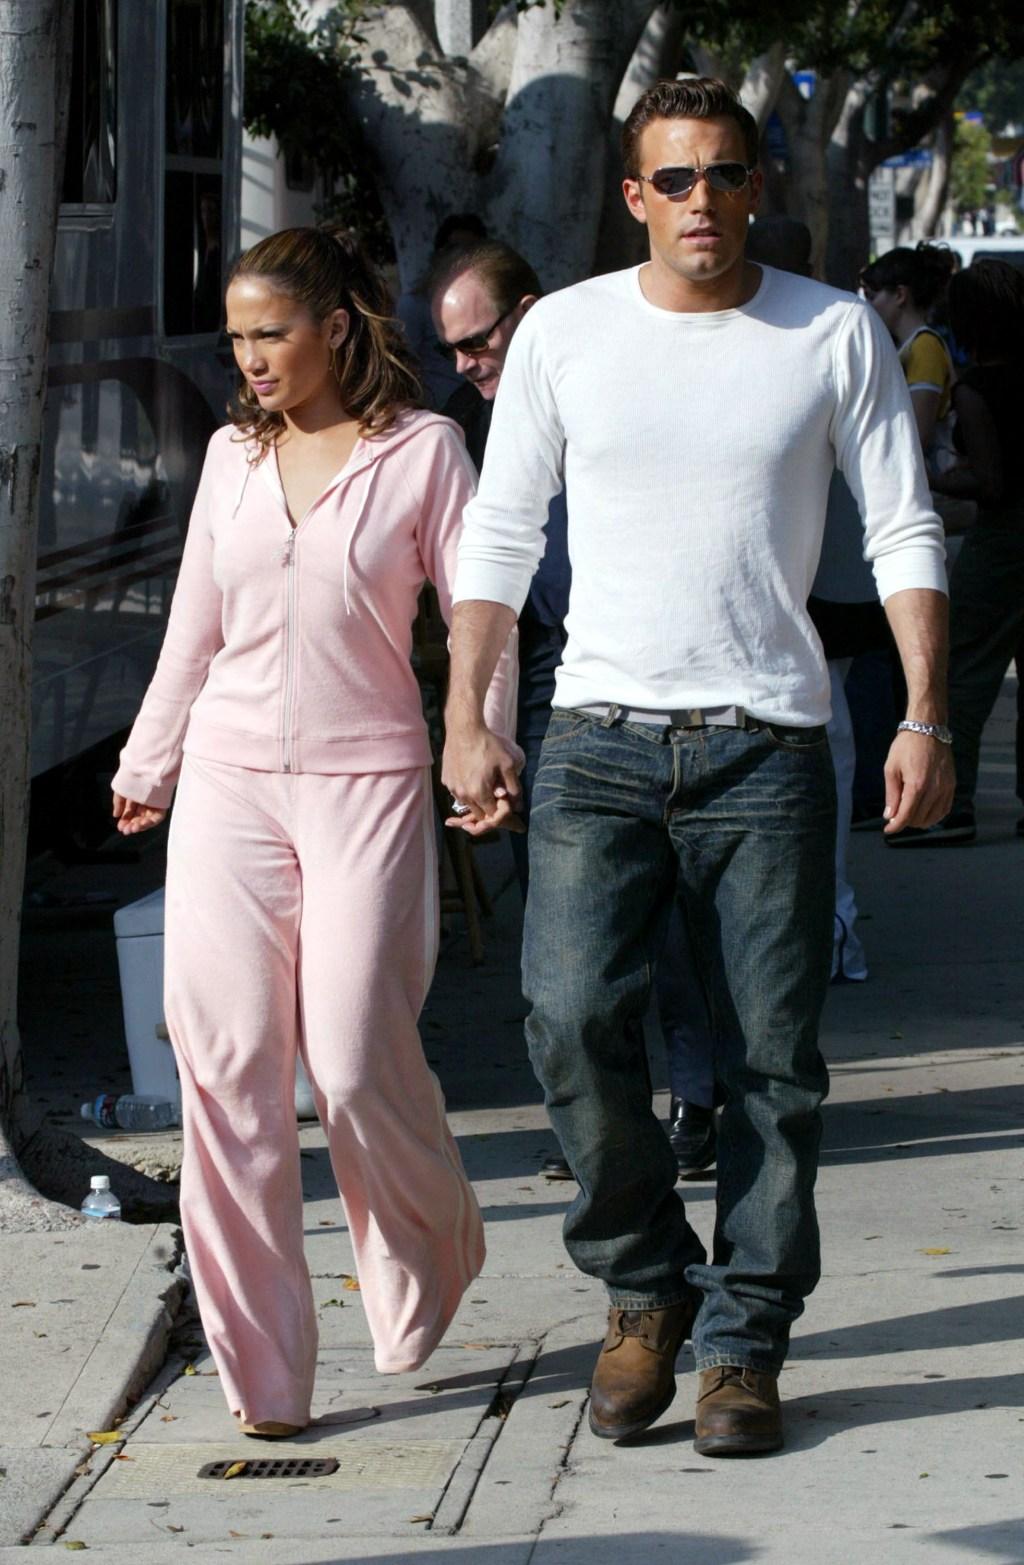 Ben Affleck waits for Jennifer Lopez